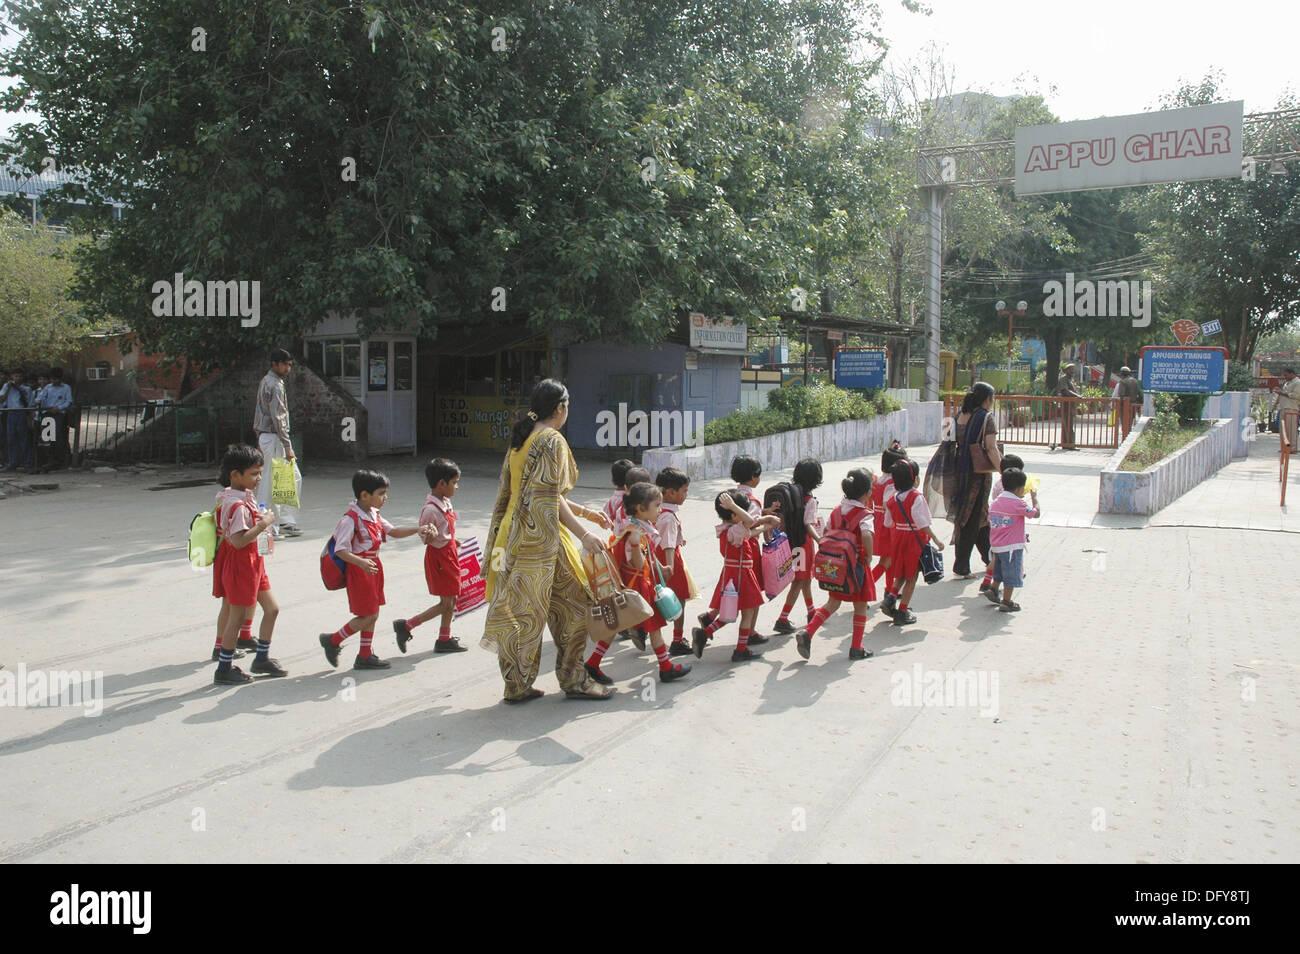 Delhi india school children visit the appu ghar amusement park delhi india school children visit the appu ghar amusement park thecheapjerseys Images